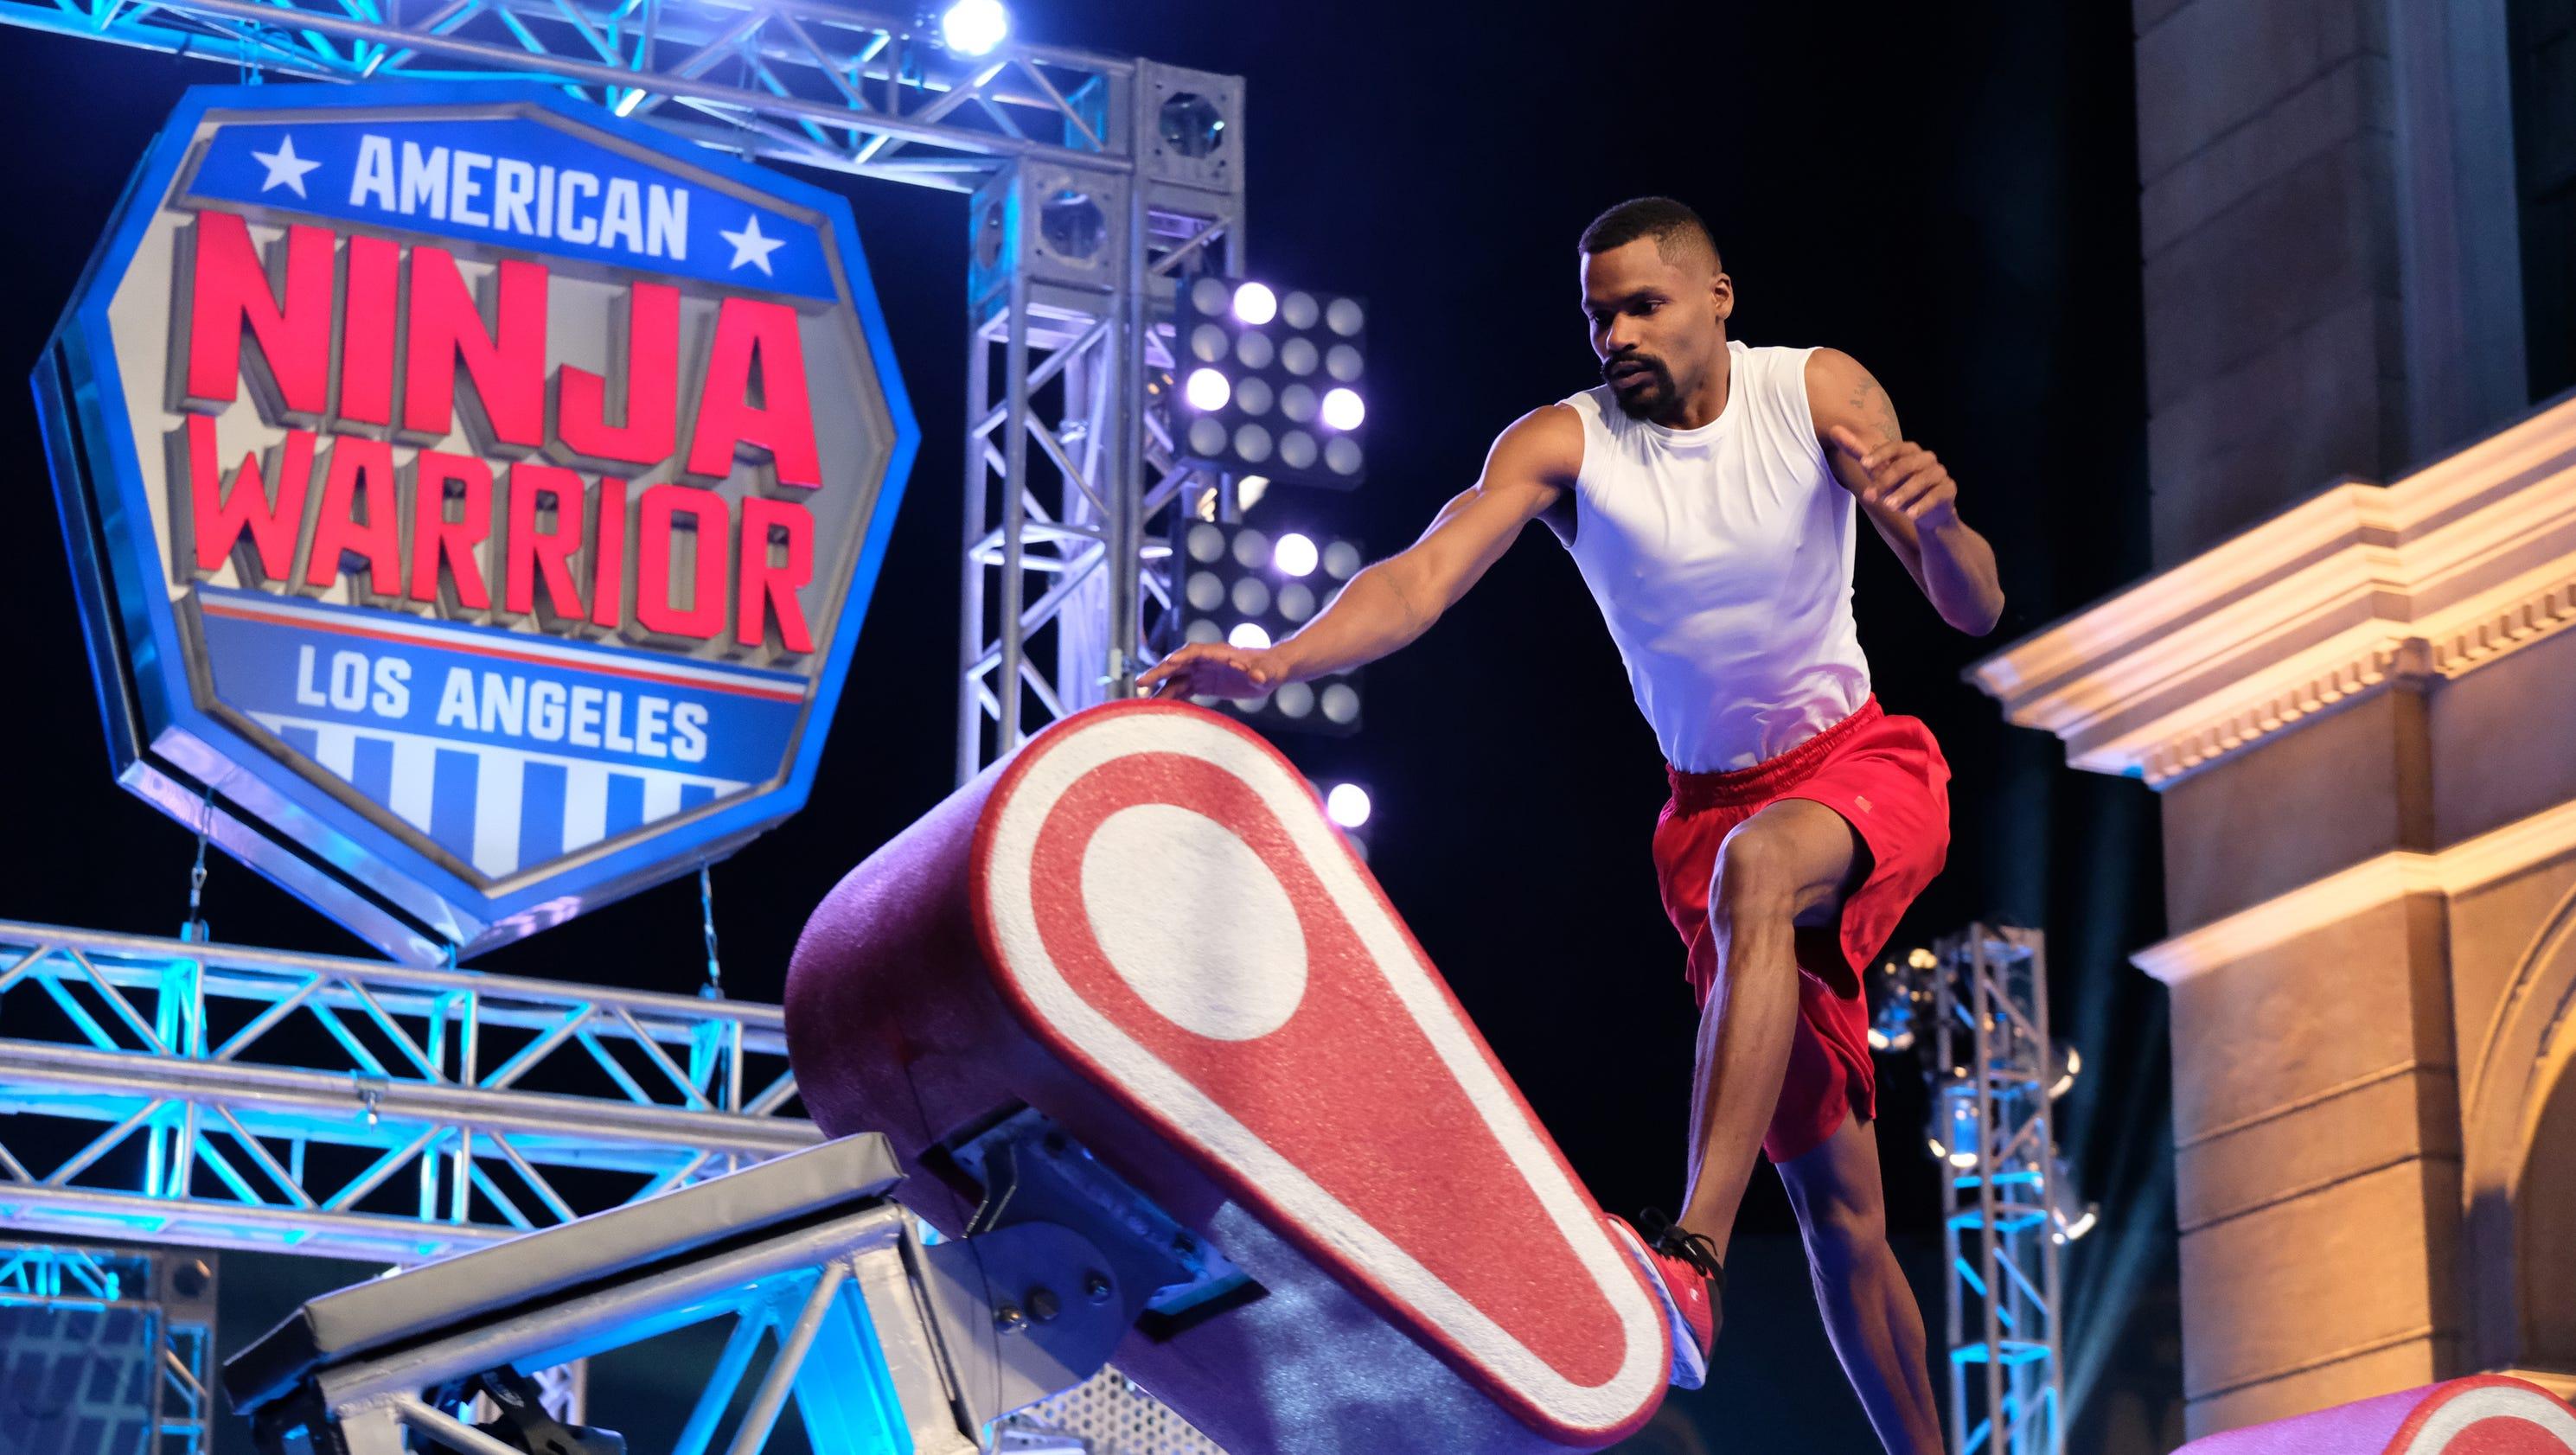 TV ratings: NBA Finals up, 'American Ninja Warrior' down